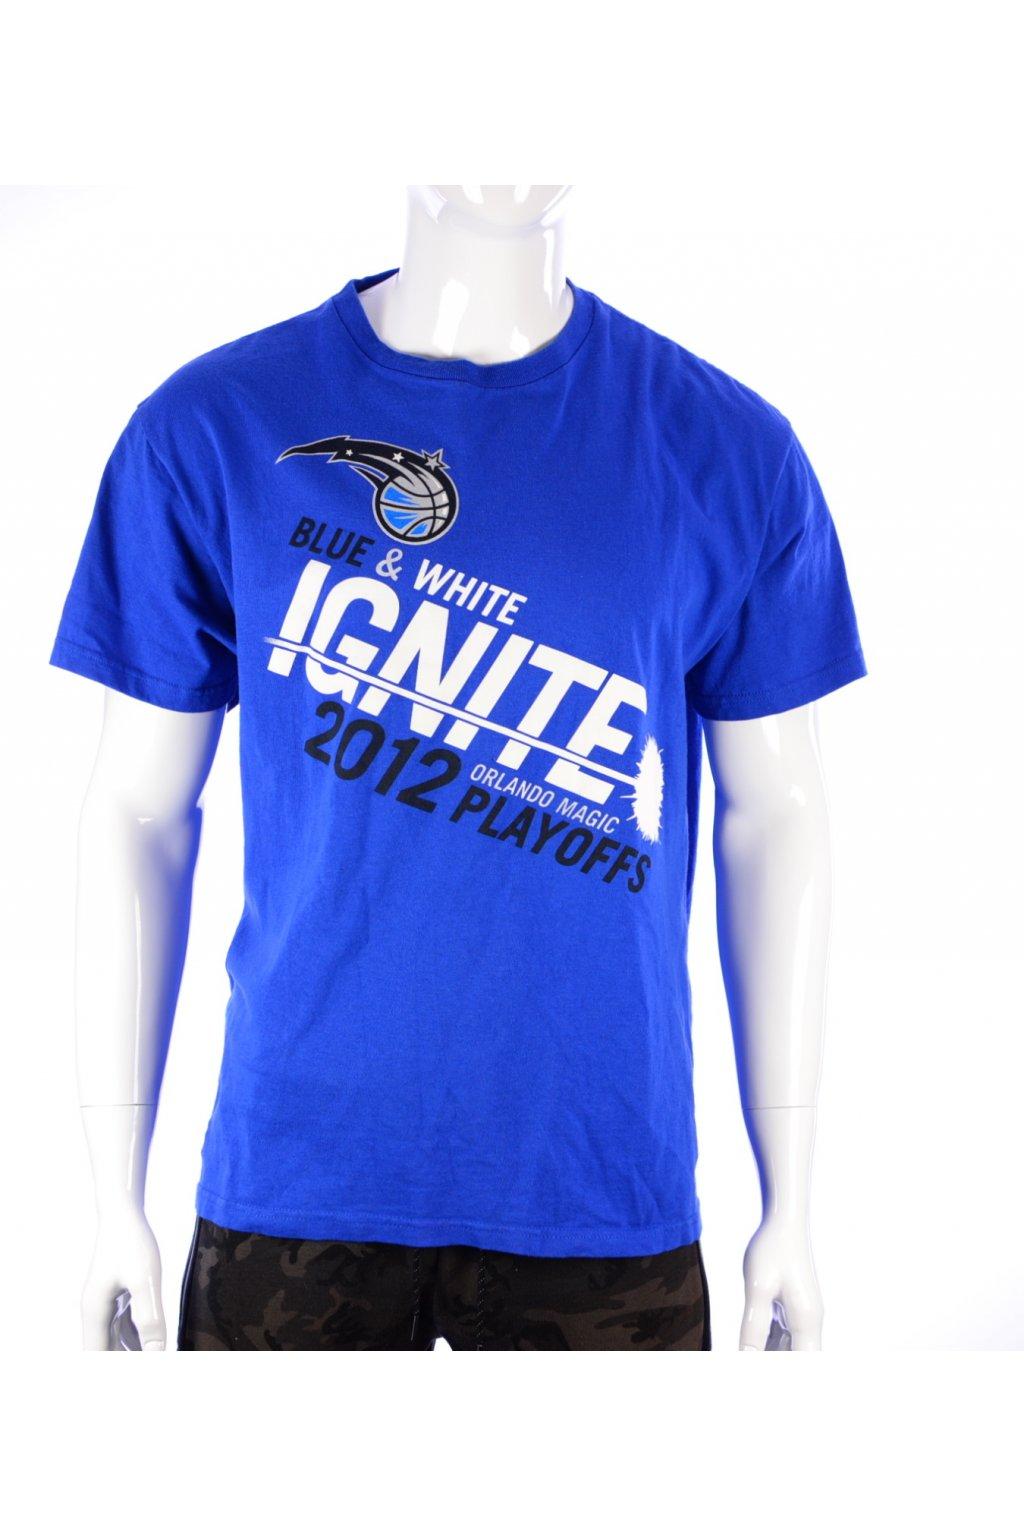 Tričko Delta Pro Weight vel XL modré s nápisy